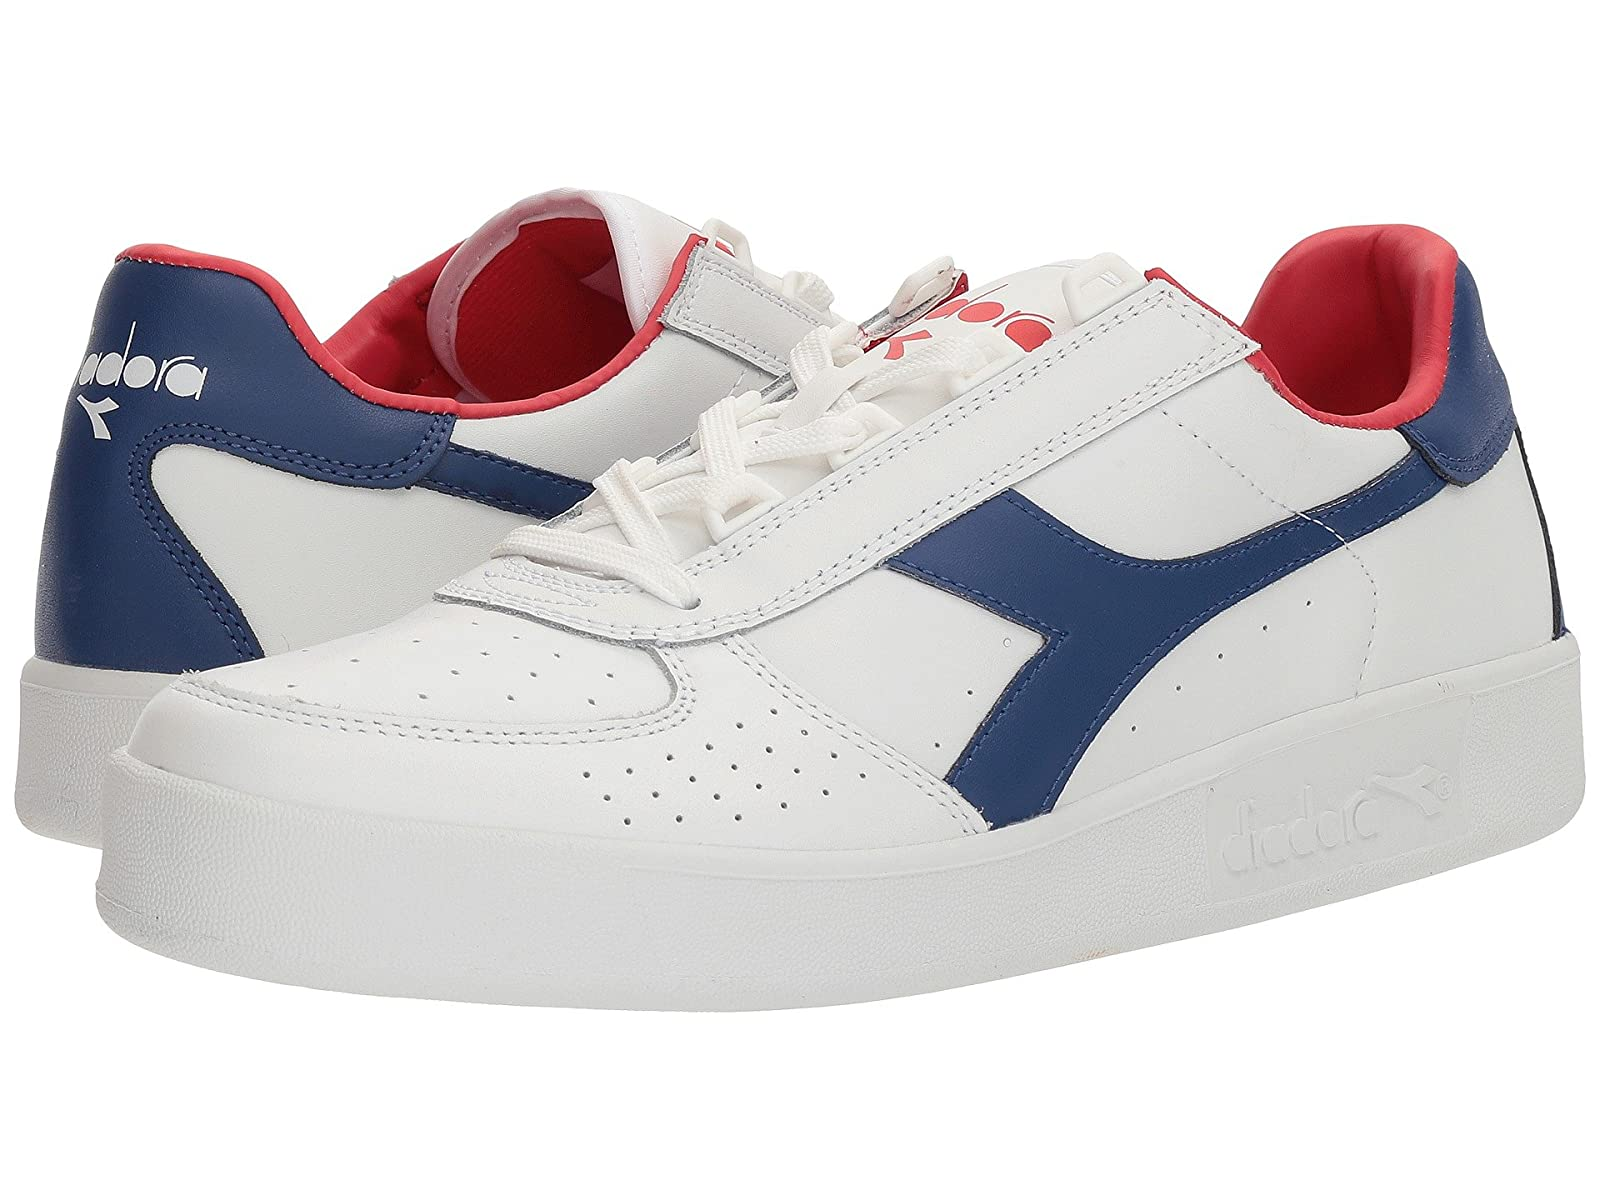 Diadora B. EliteAtmospheric grades have affordable shoes